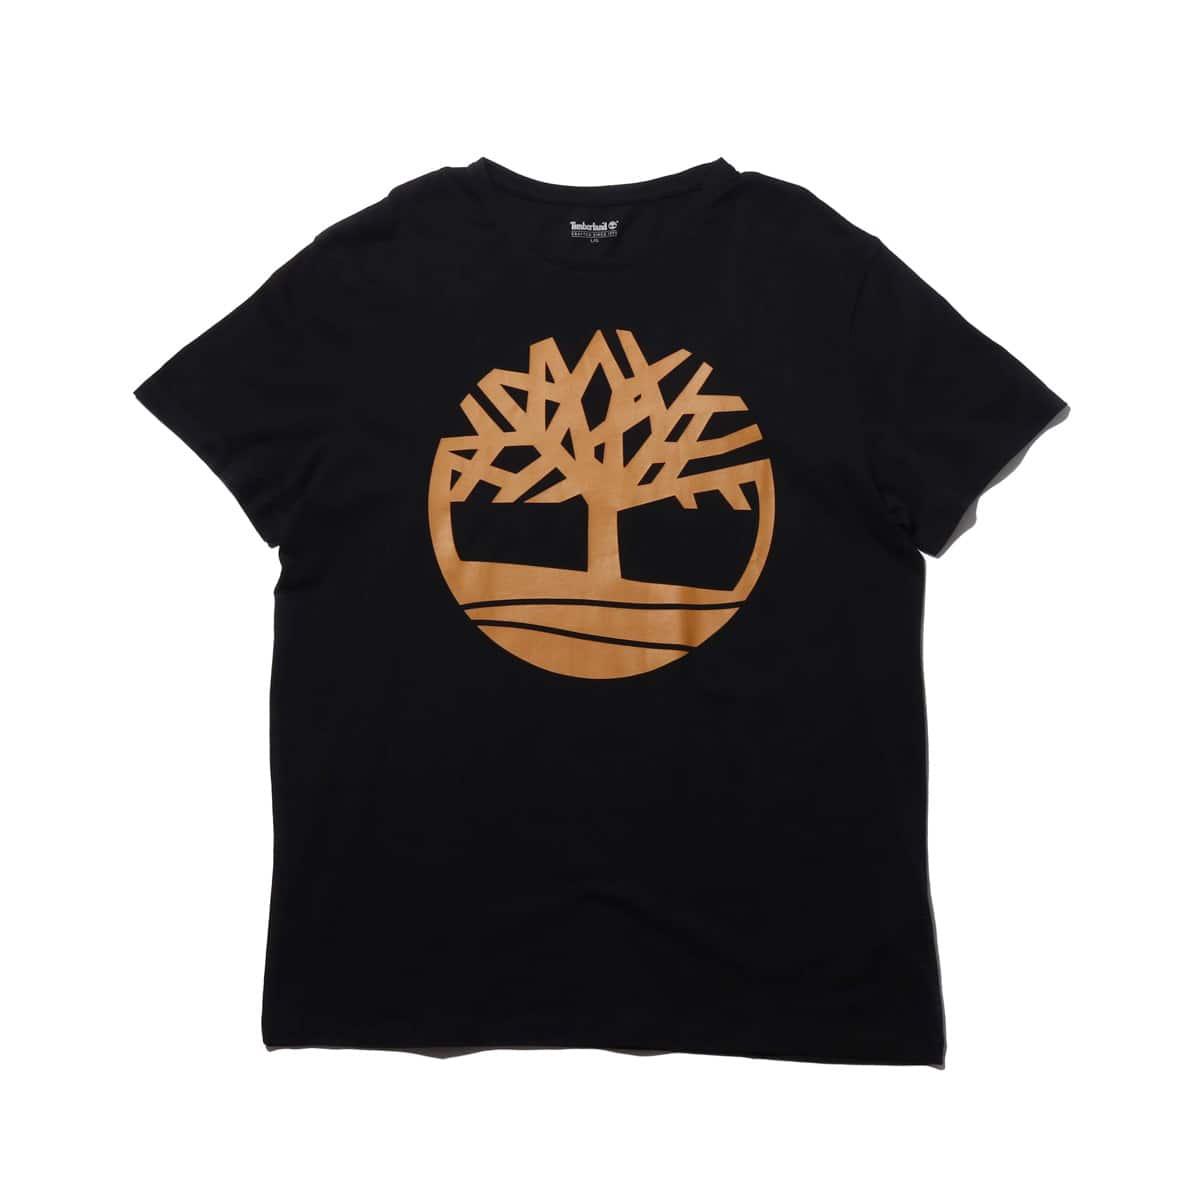 Timberland SLS SS Seasonal logo tee  BLACK 19SS-I_photo_large